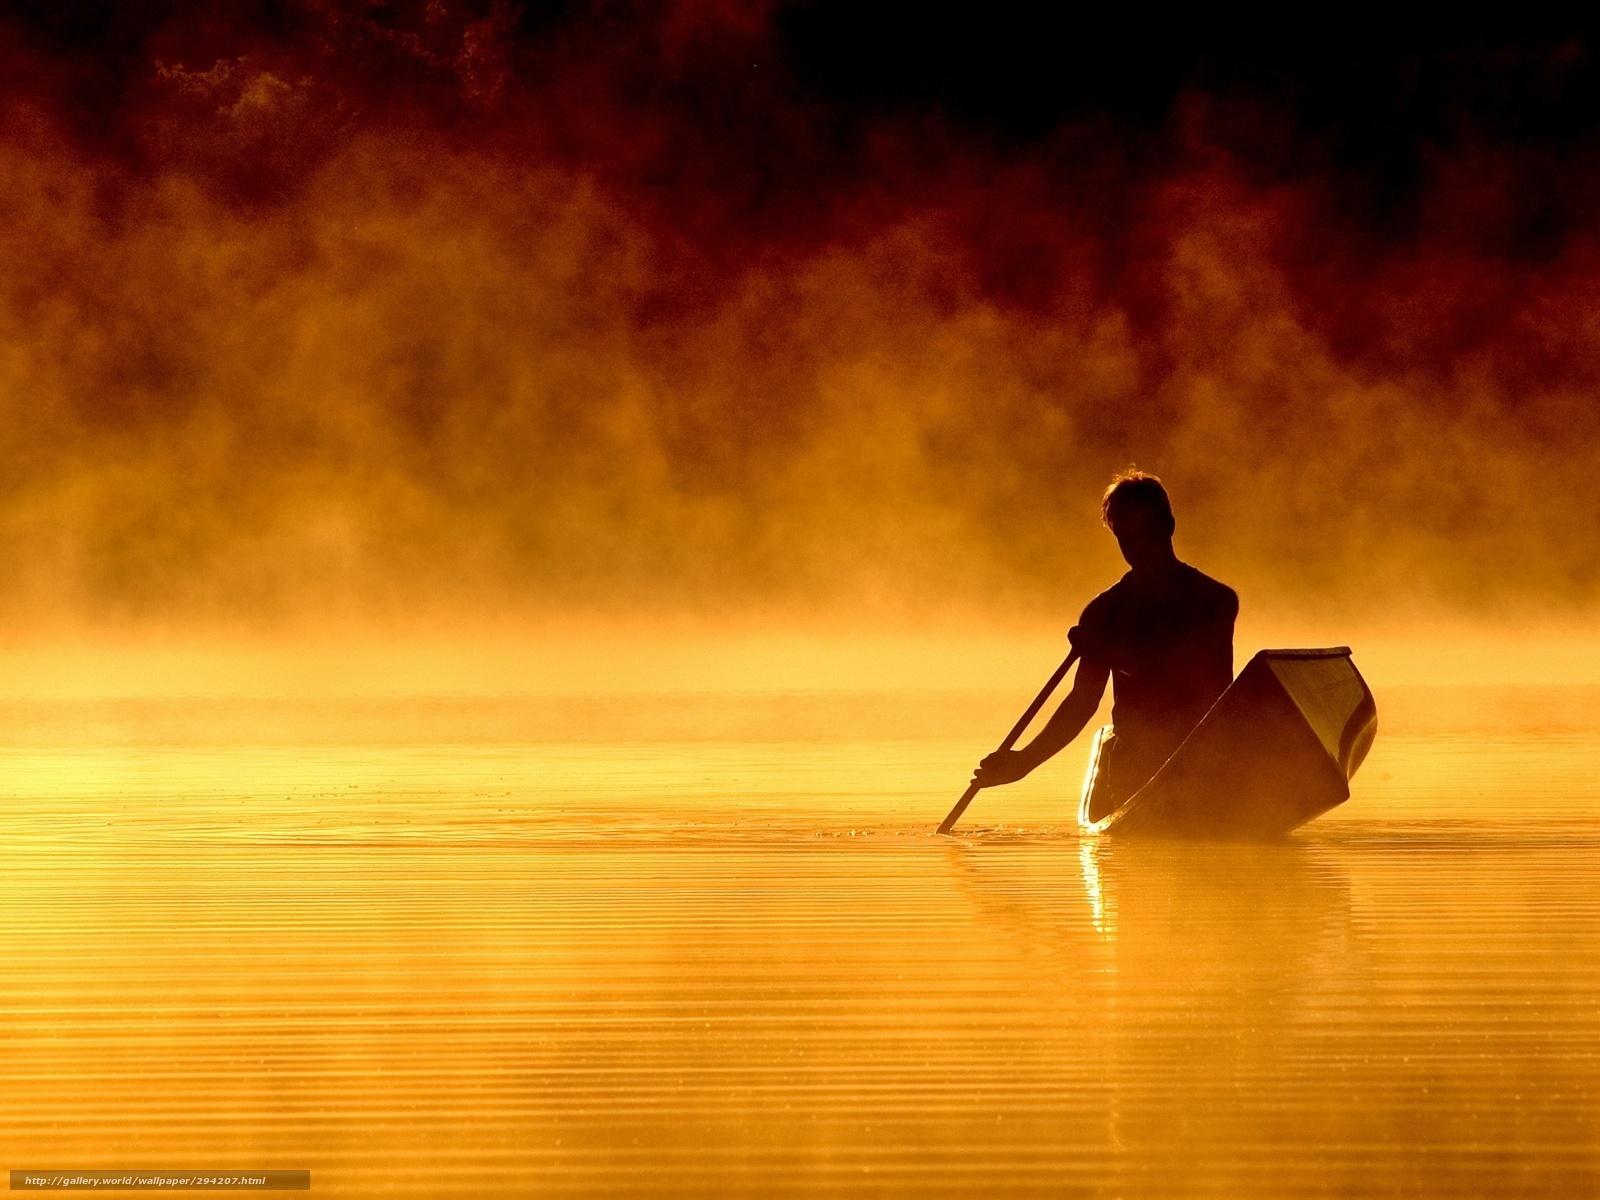 плывем на лодке музыка